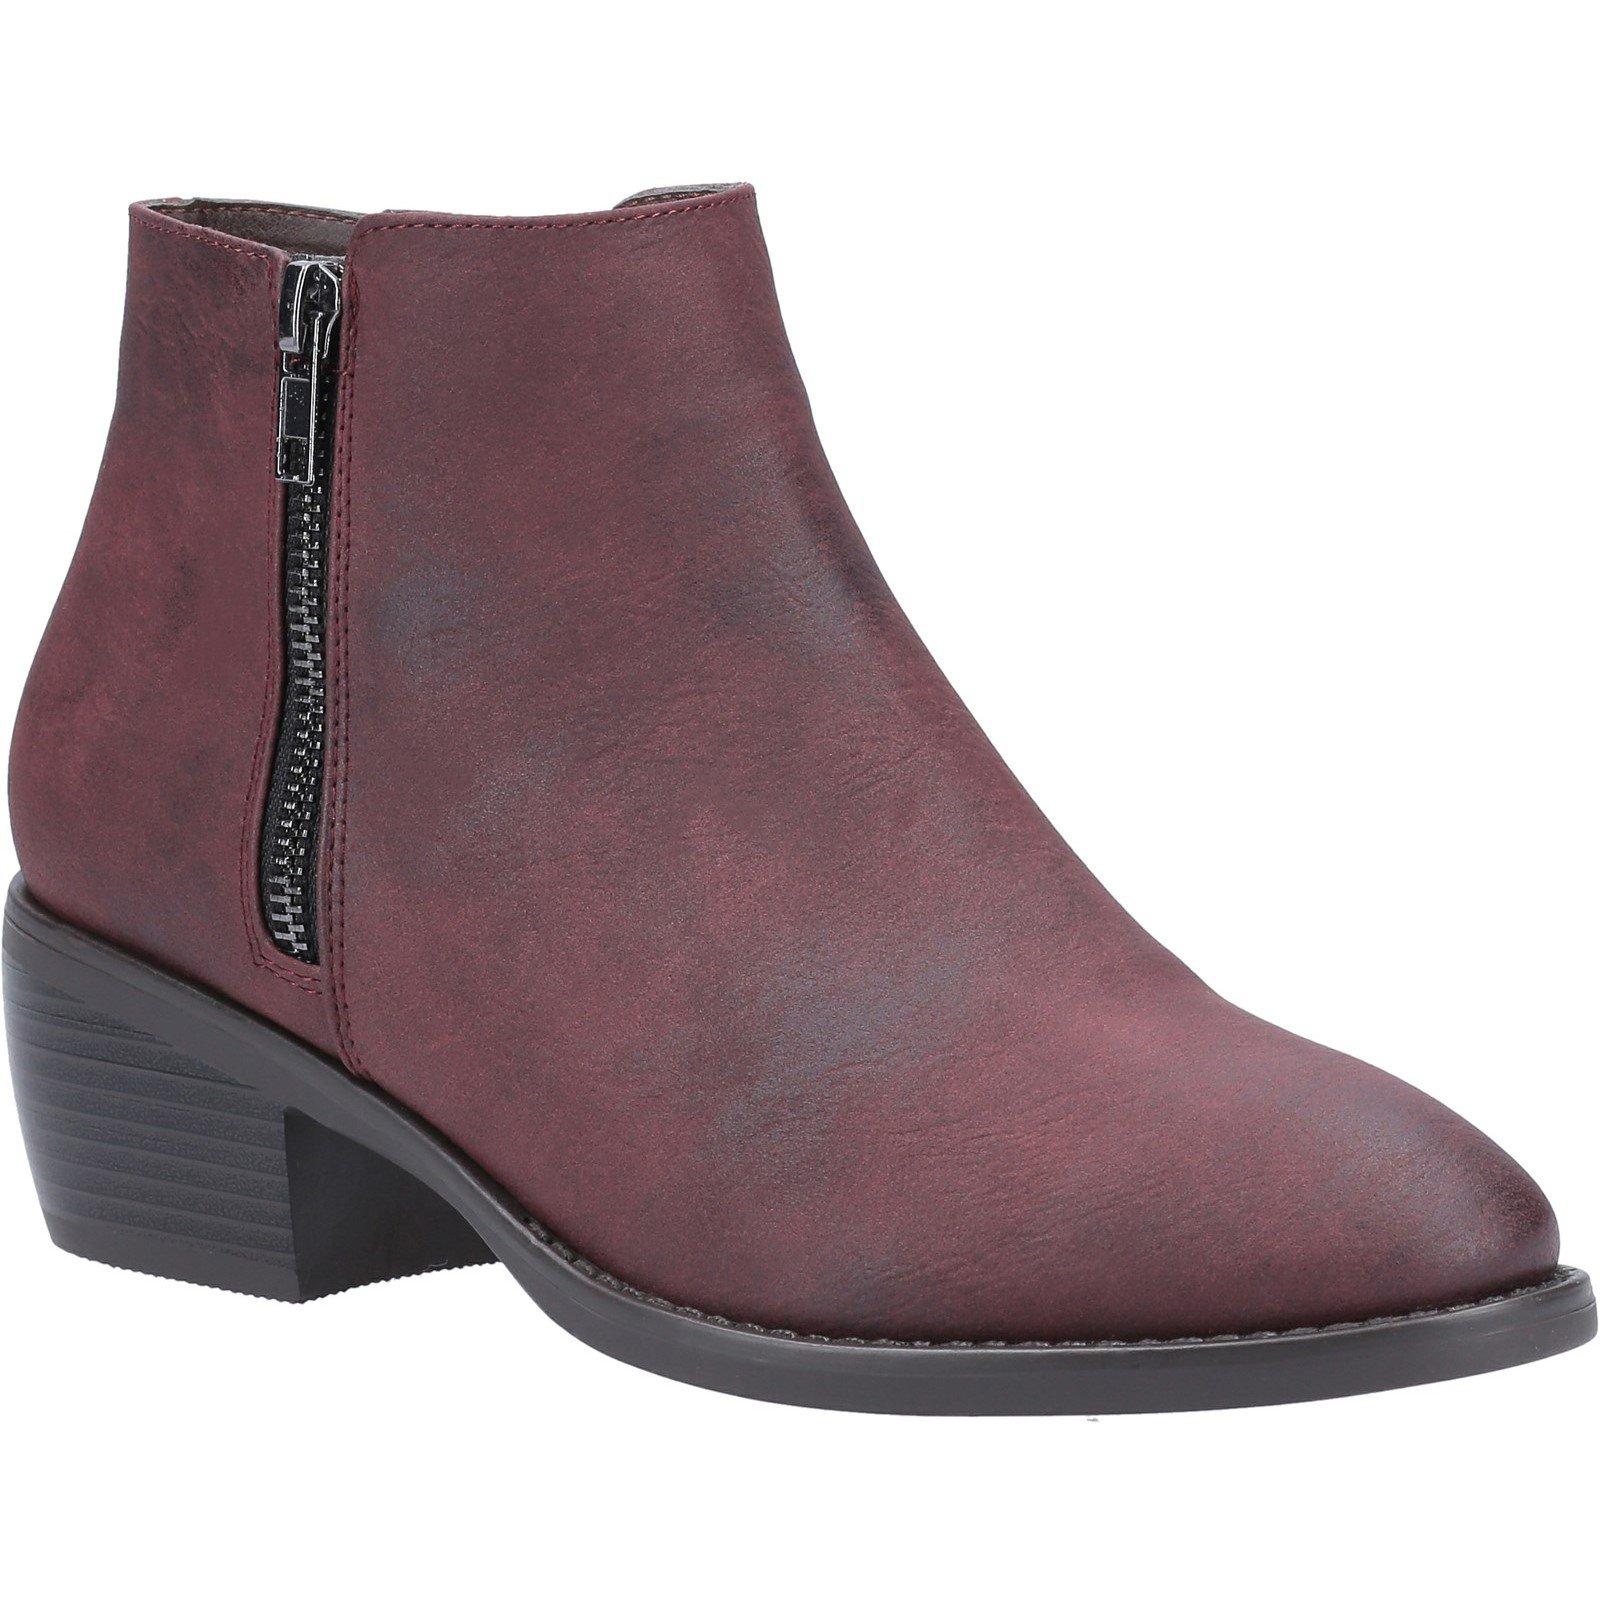 Divaz Women's Ruby Ankle Boot Various Colours 31096 - Burgundy 7